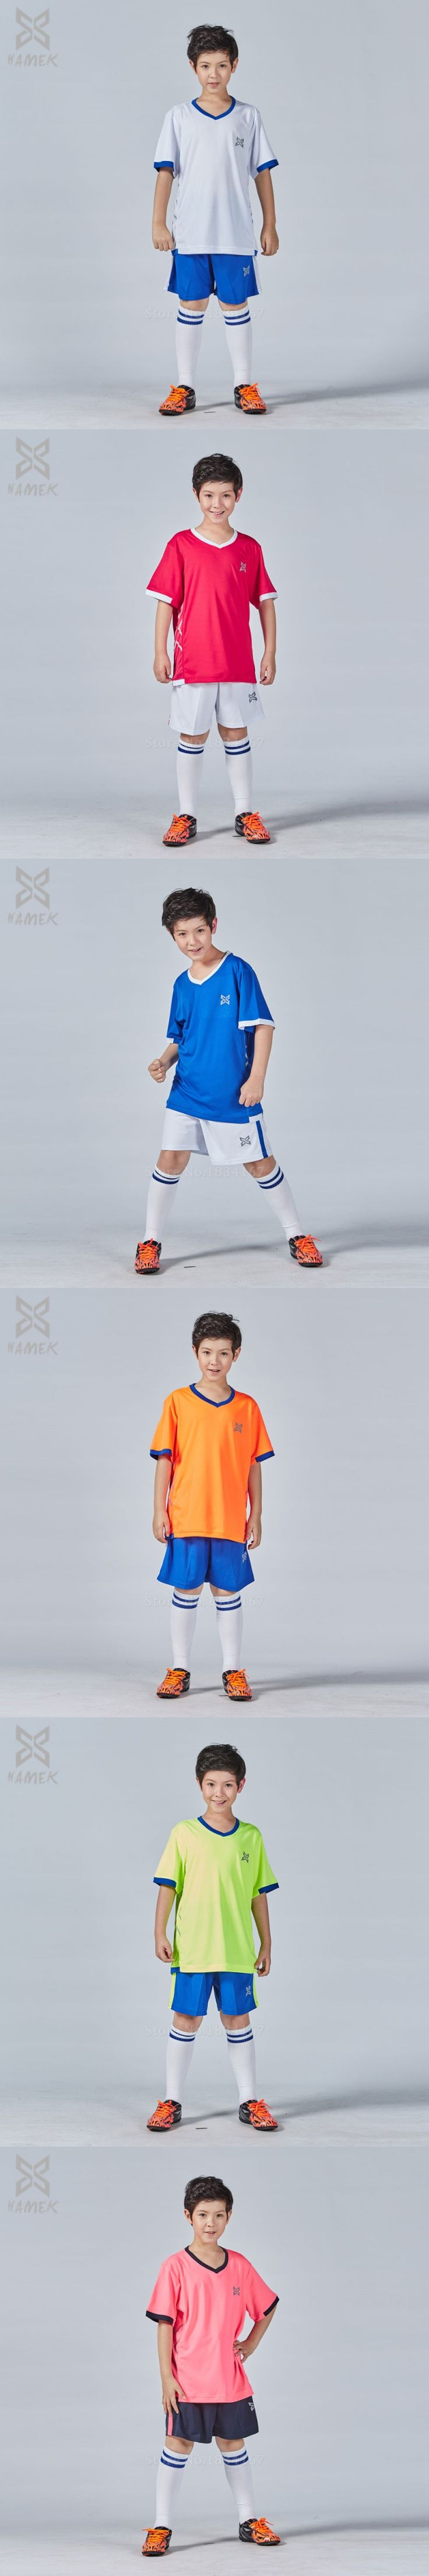 Children Soccer jerseys 2016 2017 kids soccer sets Thai quality football customized uniforms kits boys short sleeves new